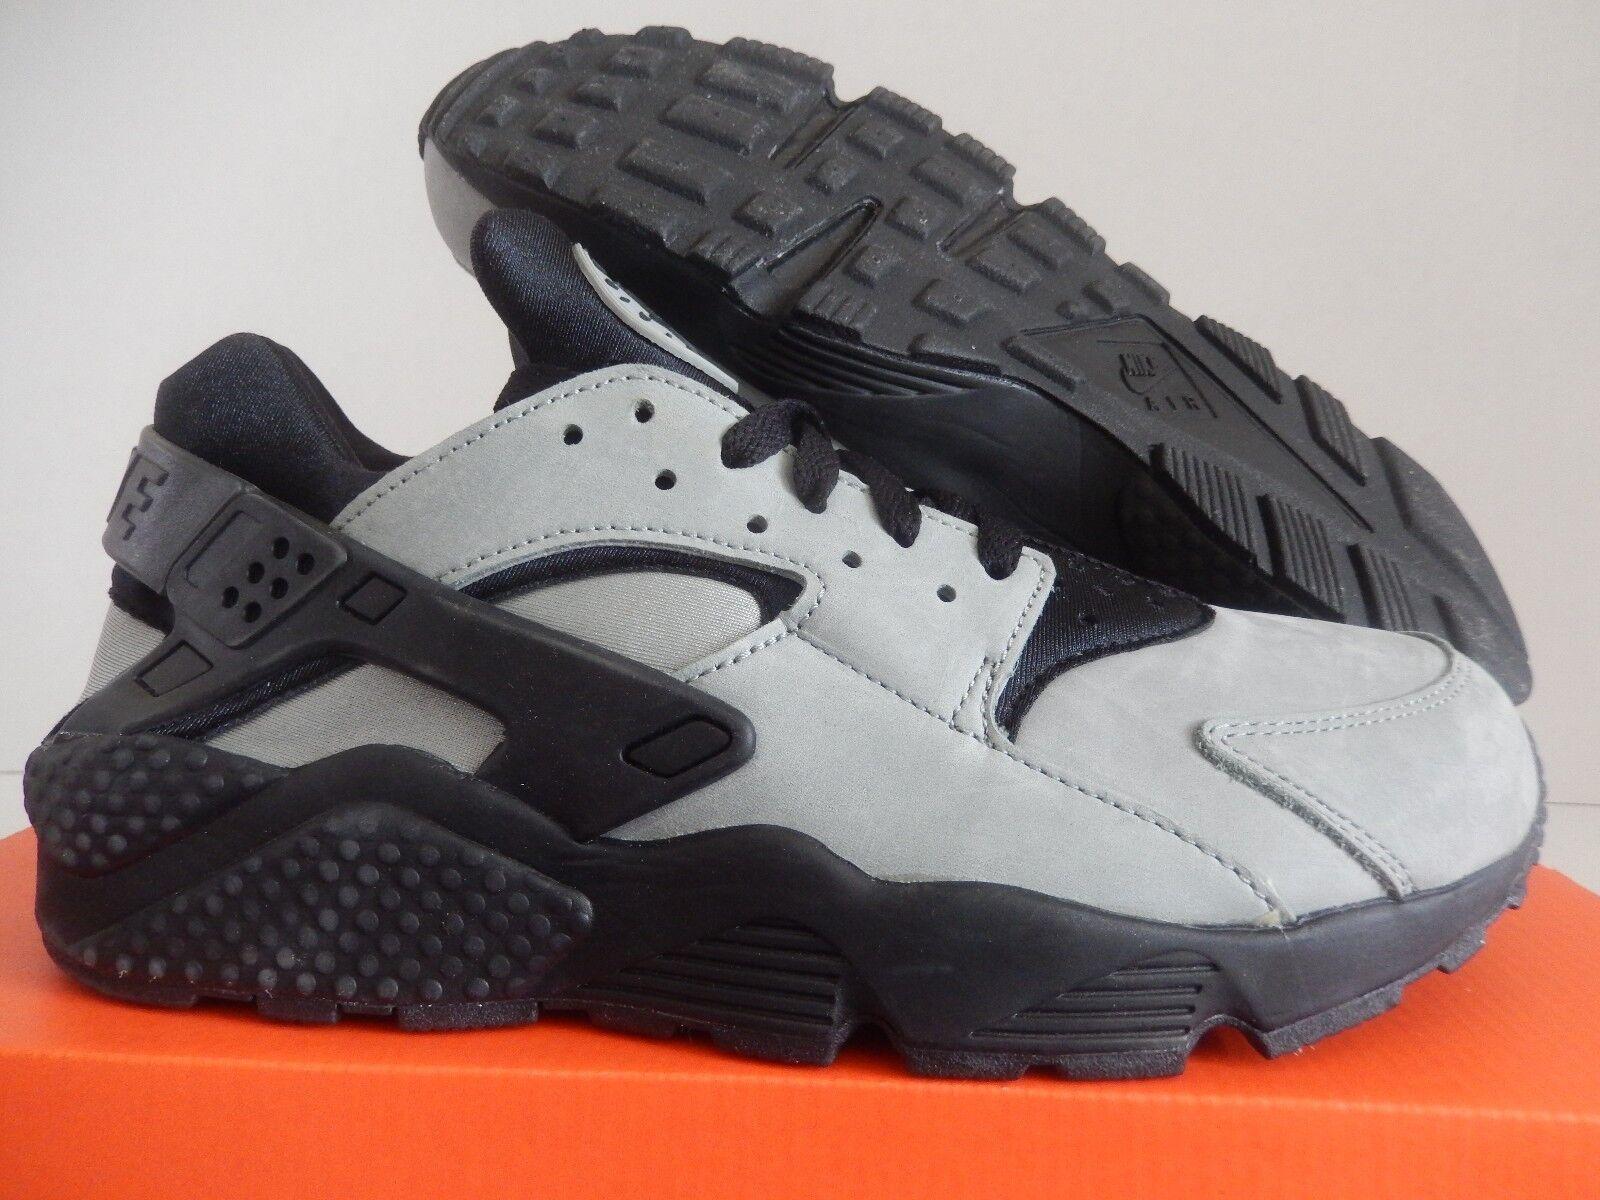 Nike 8,5 air huarache lauf prm premium glimmer green-schwarz sz 8,5 Nike db38a9